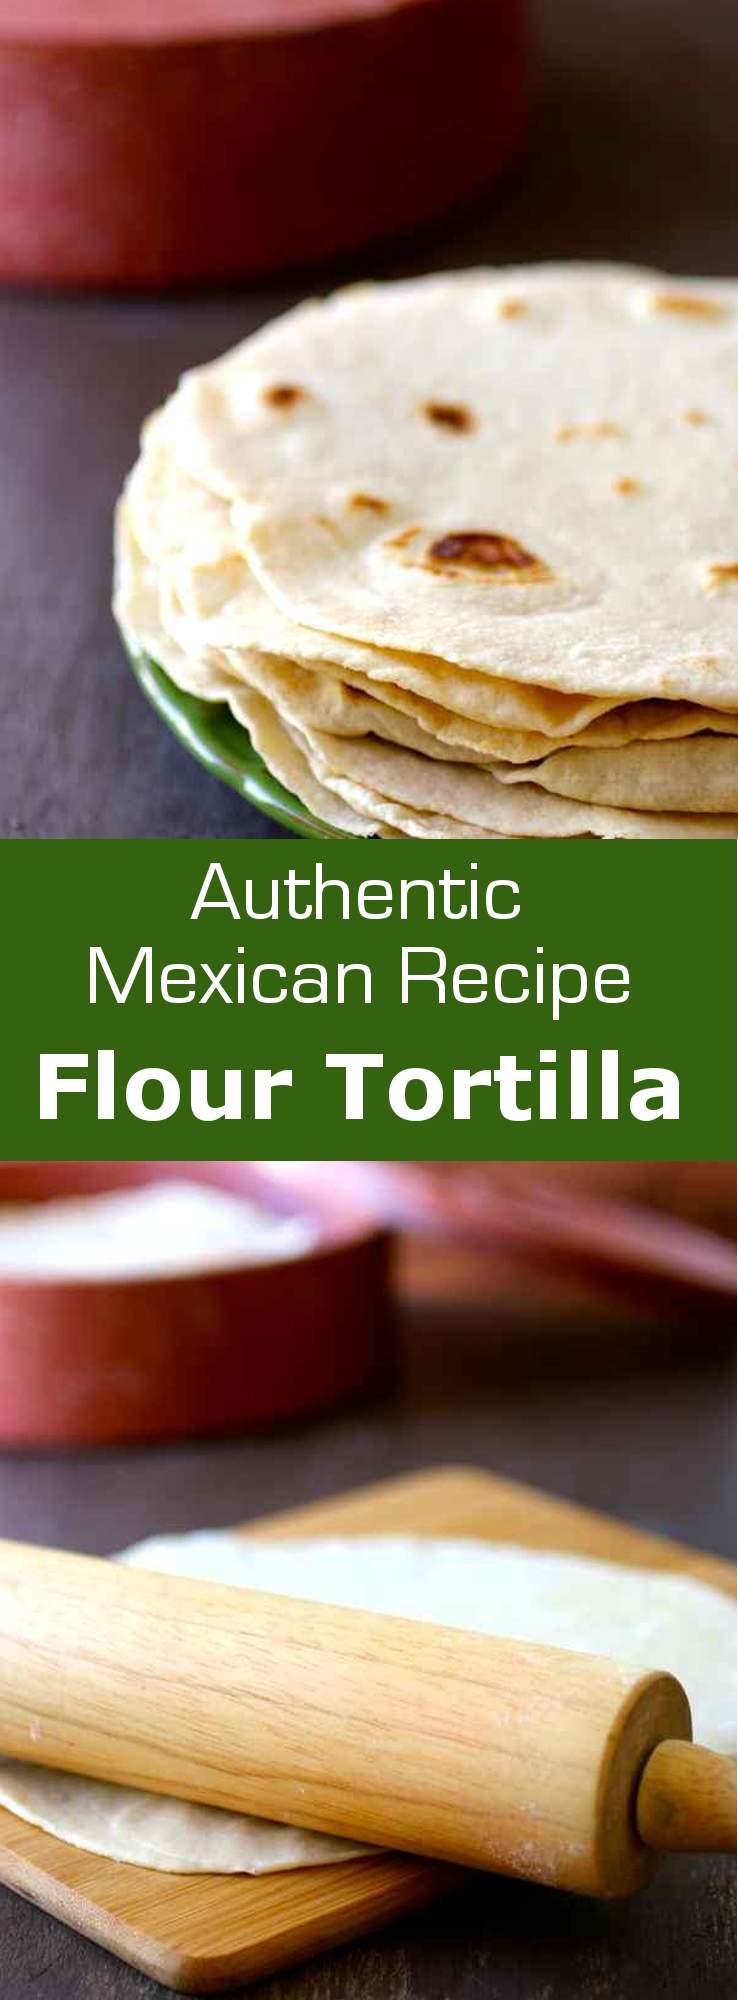 how to make thin flour tortillas